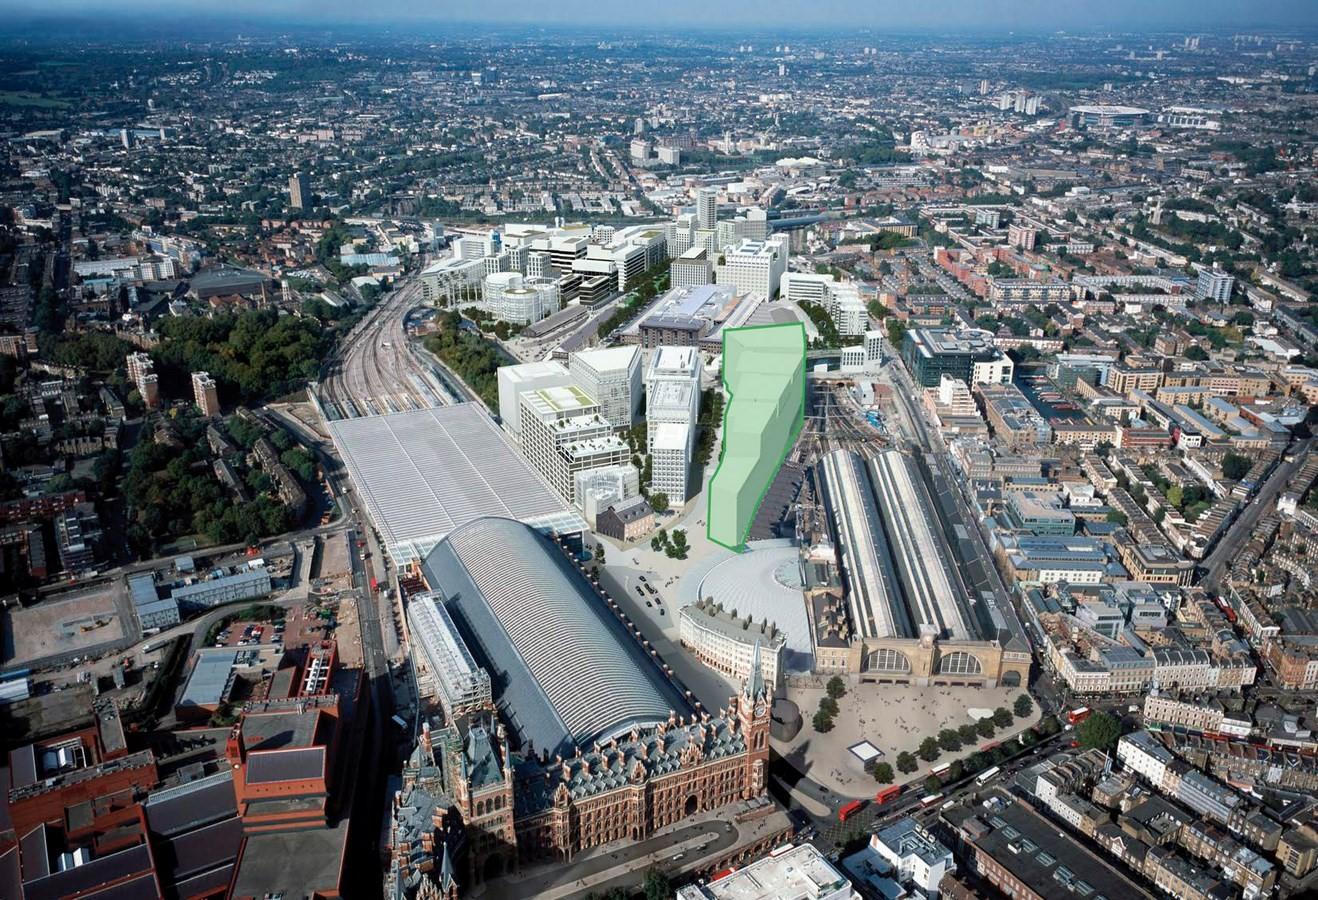 Google King's Cross – London, United Kingdom - Sheet4